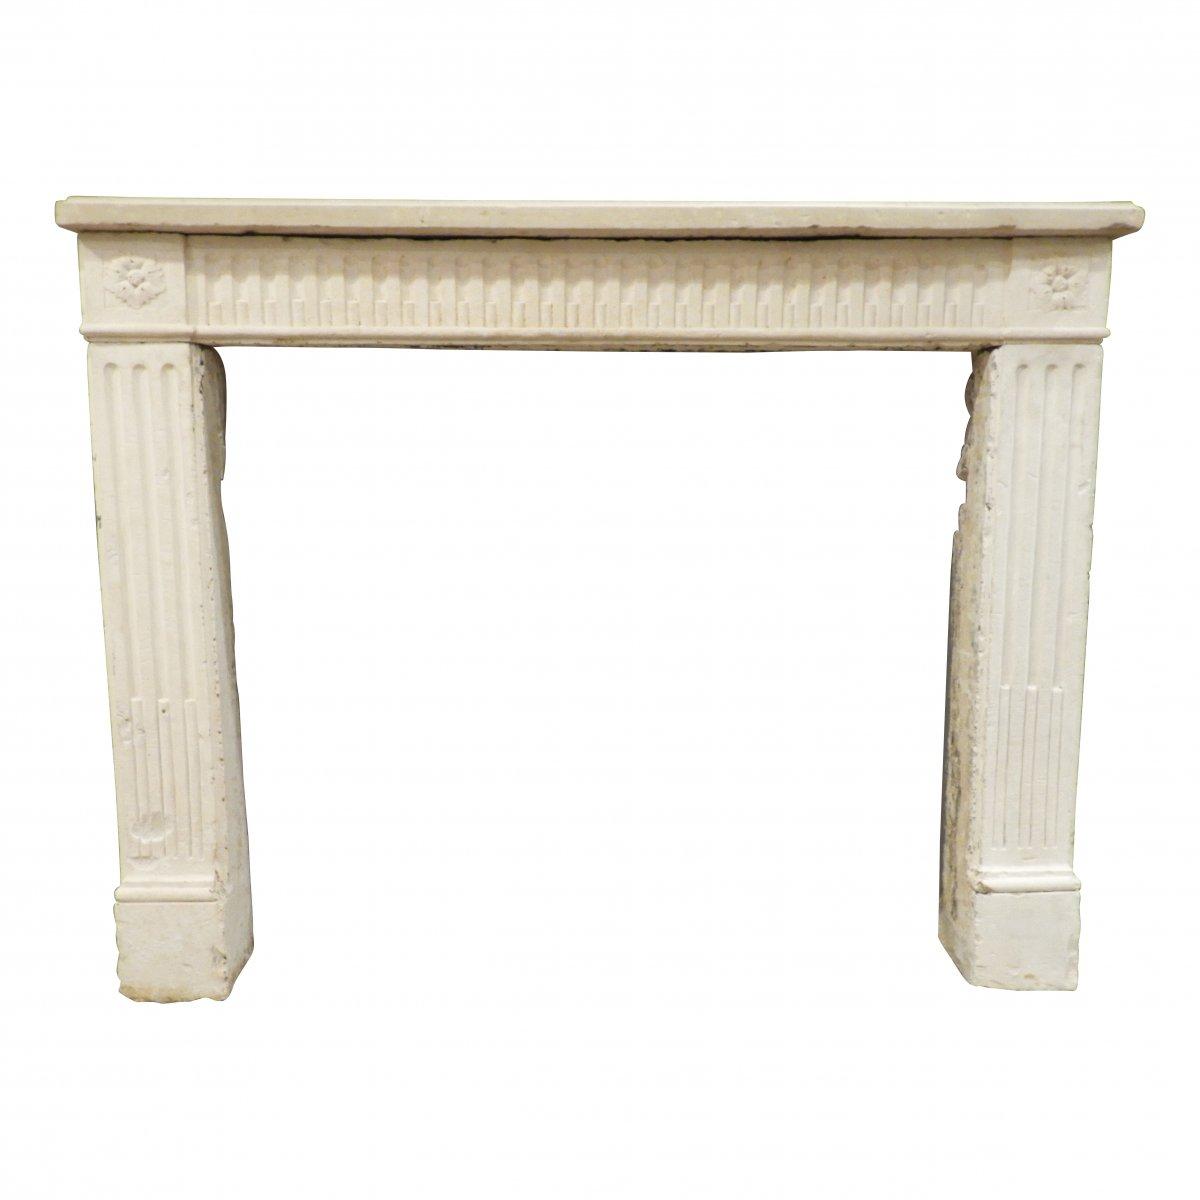 Louis XVI Parisian Fireplace